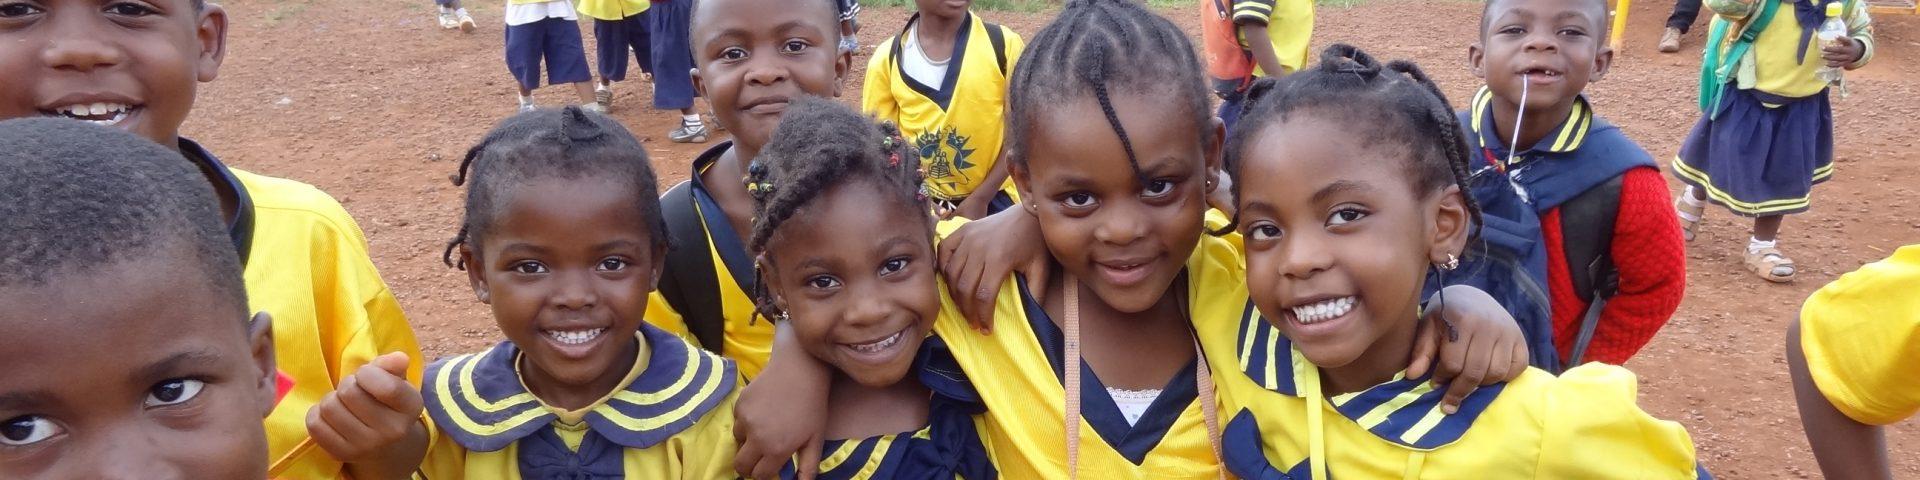 Lachende kinderen uit Tanzania in gele kleding